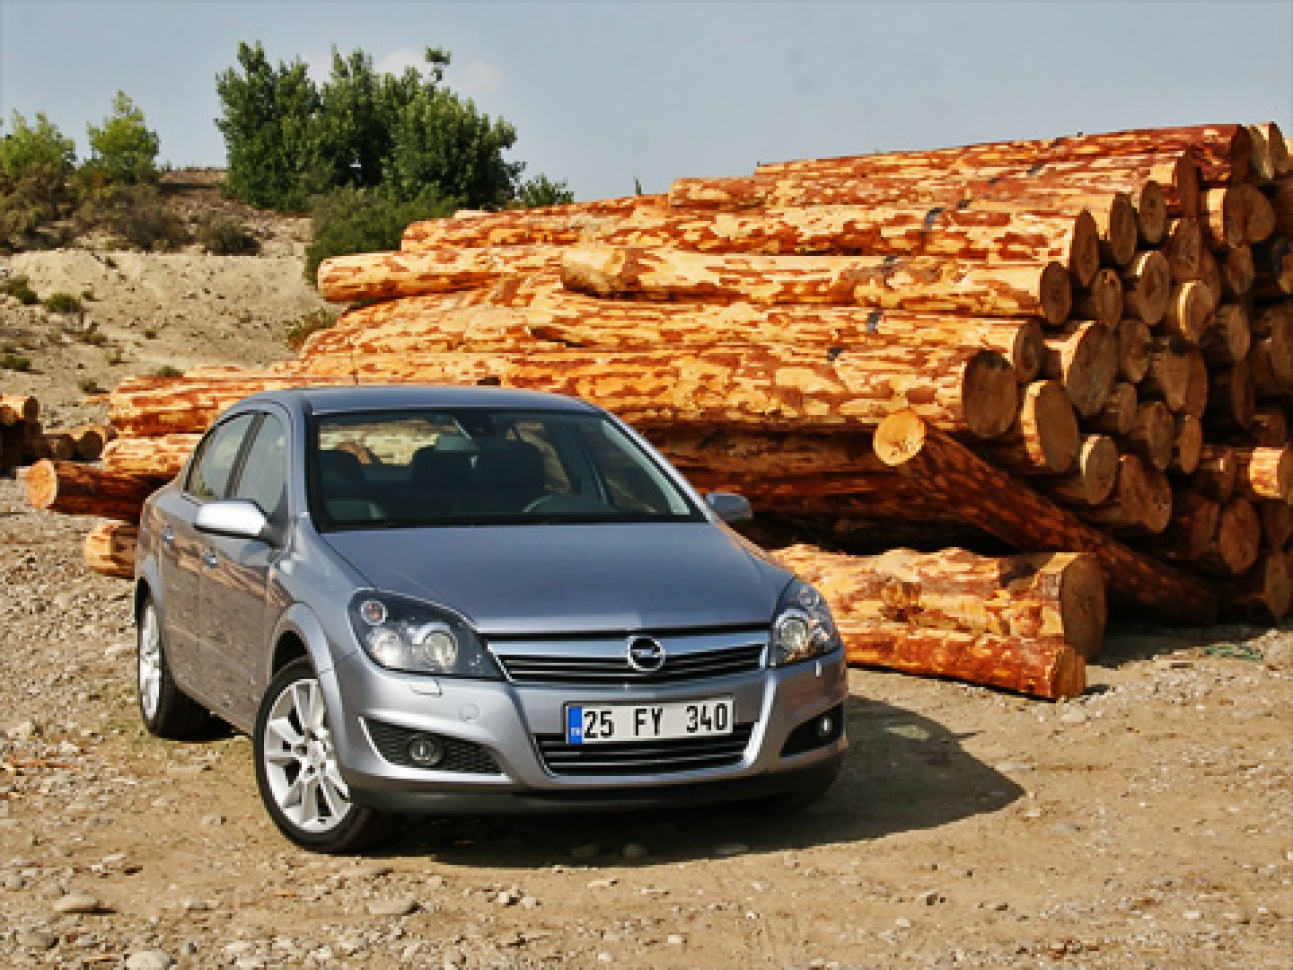 Opel astra фотогалерея